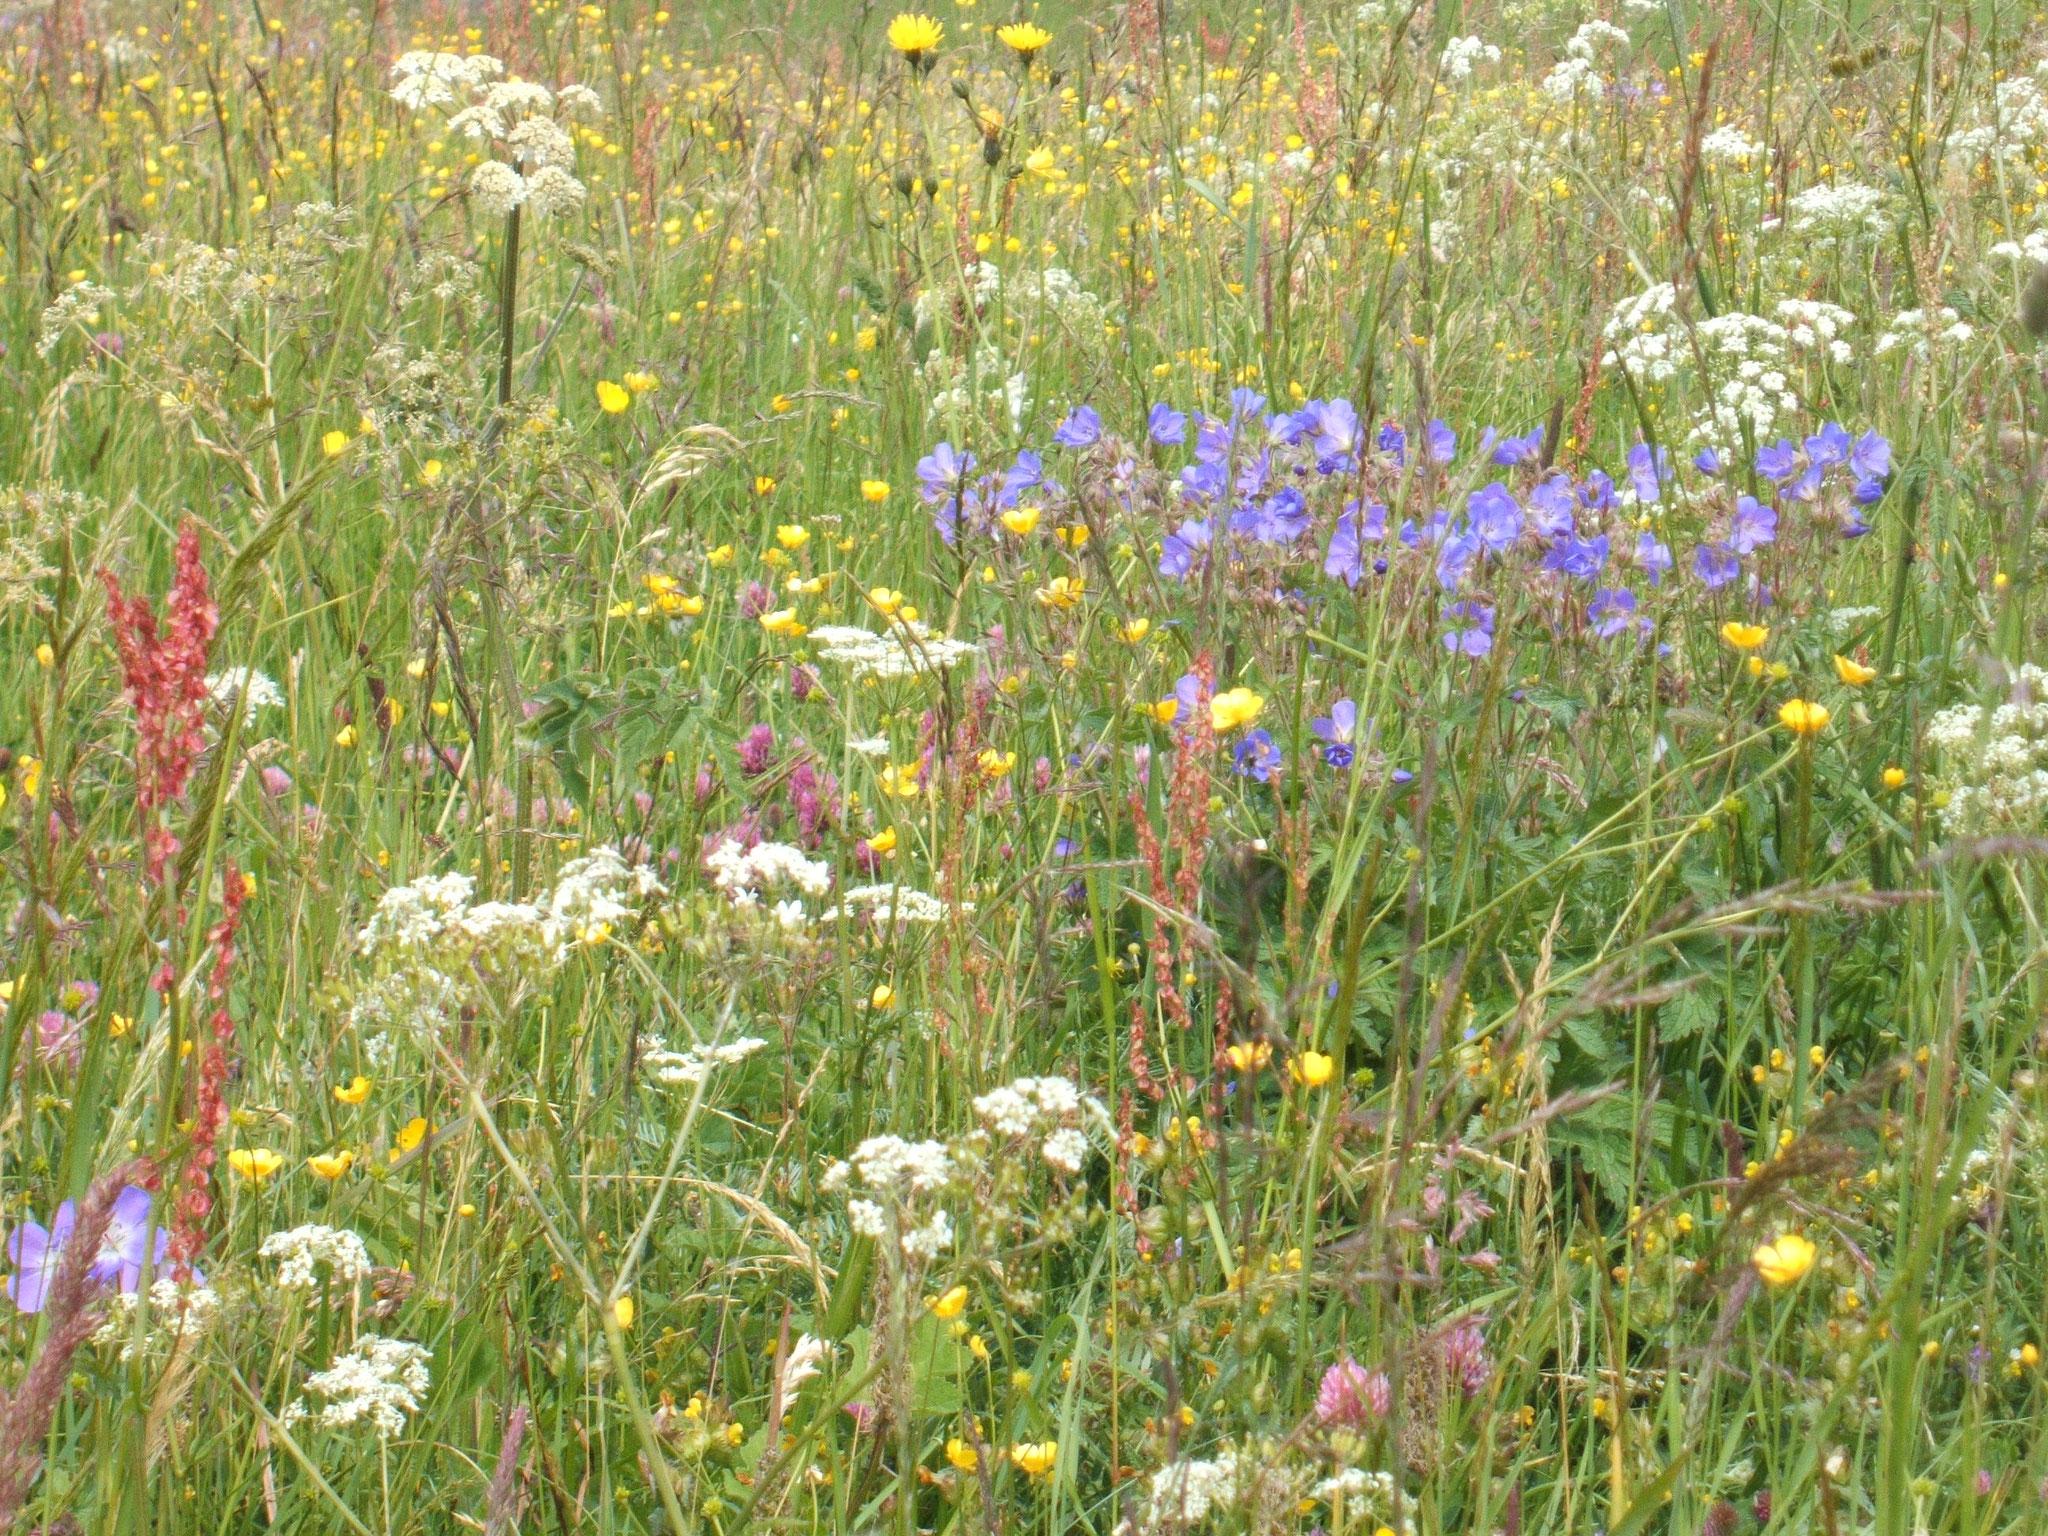 Blumenpracht auf Extensivwiese bei Hinterweiler